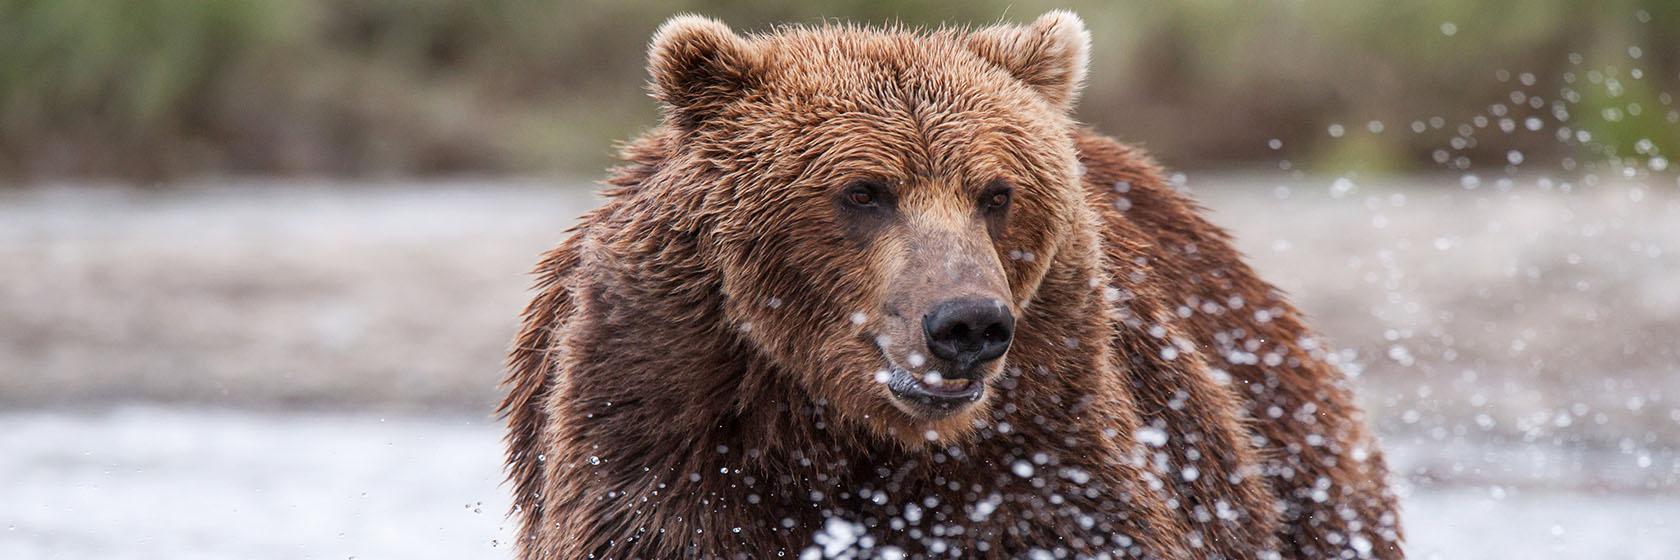 Alaskan Family Adventure with Abercrombie & Kent